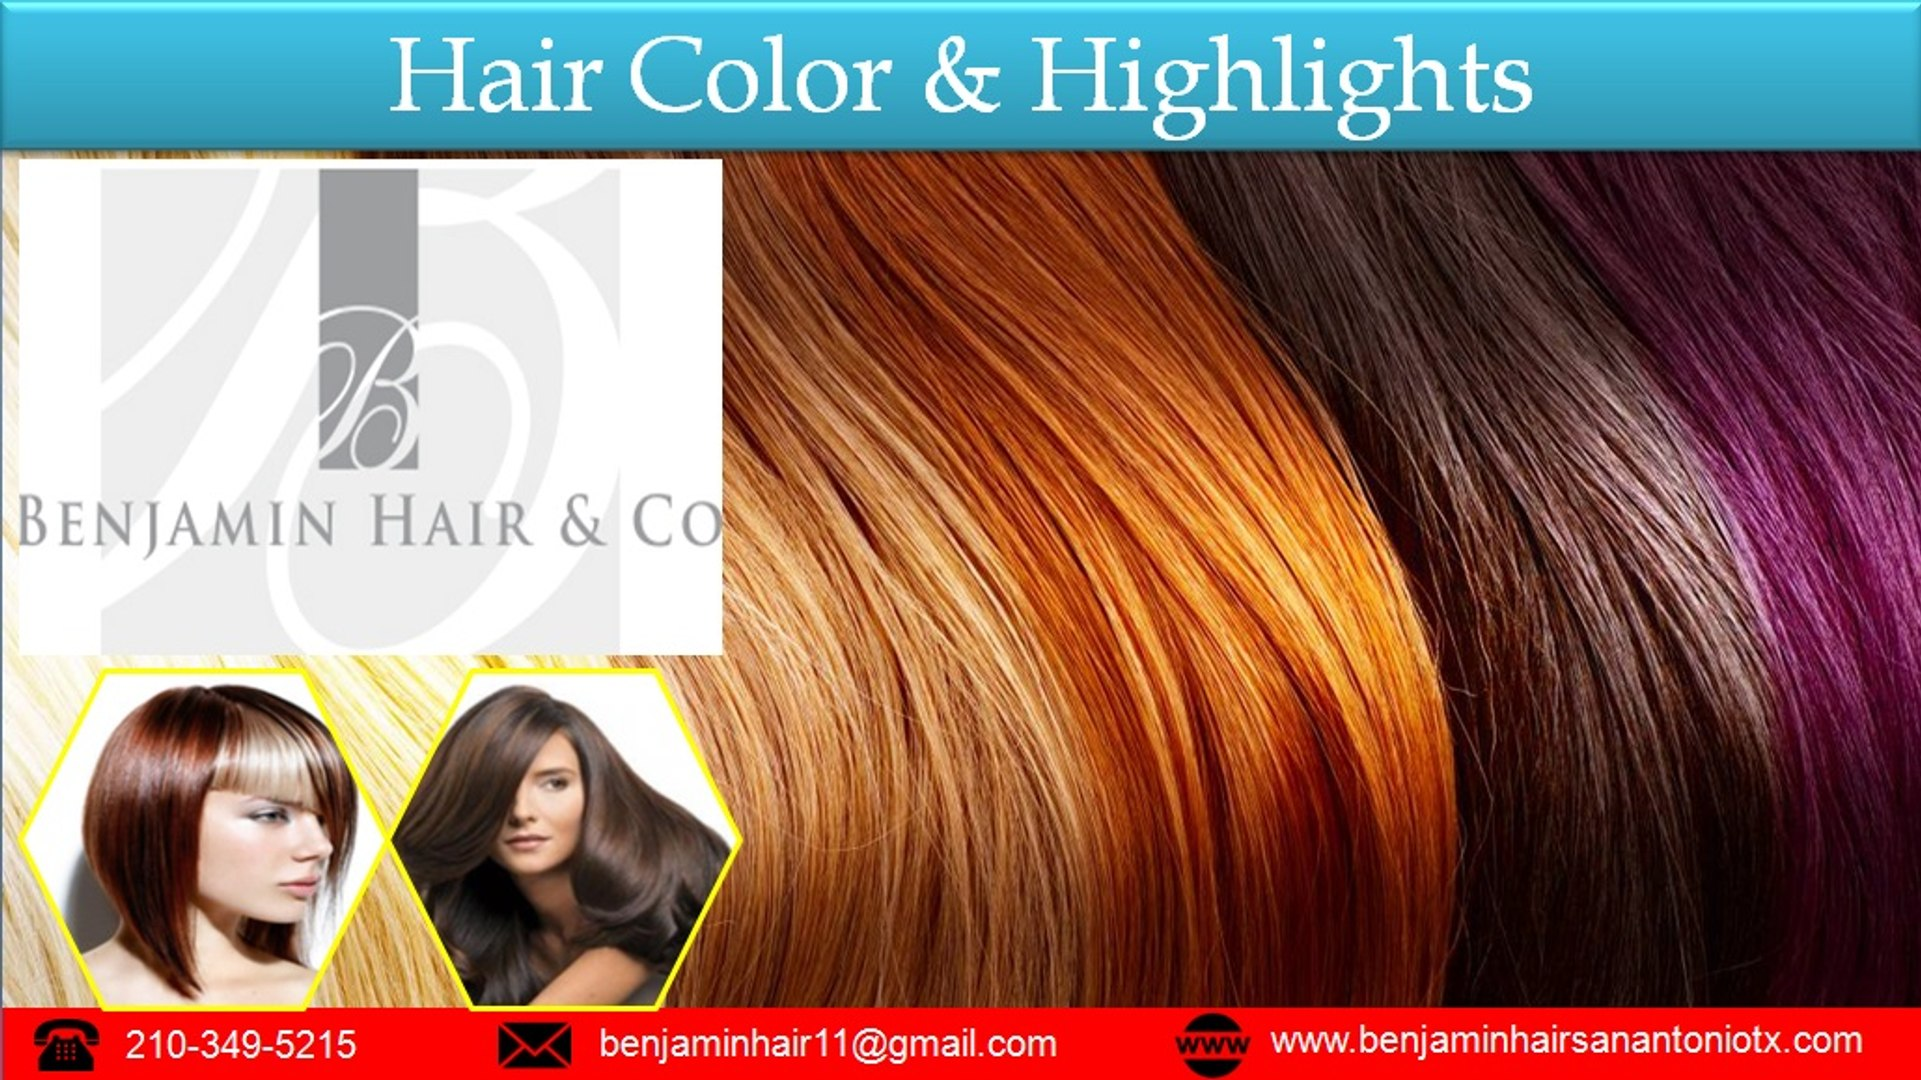 Hair Highlights & Hair Color Service - Benjamin Hair & Co.